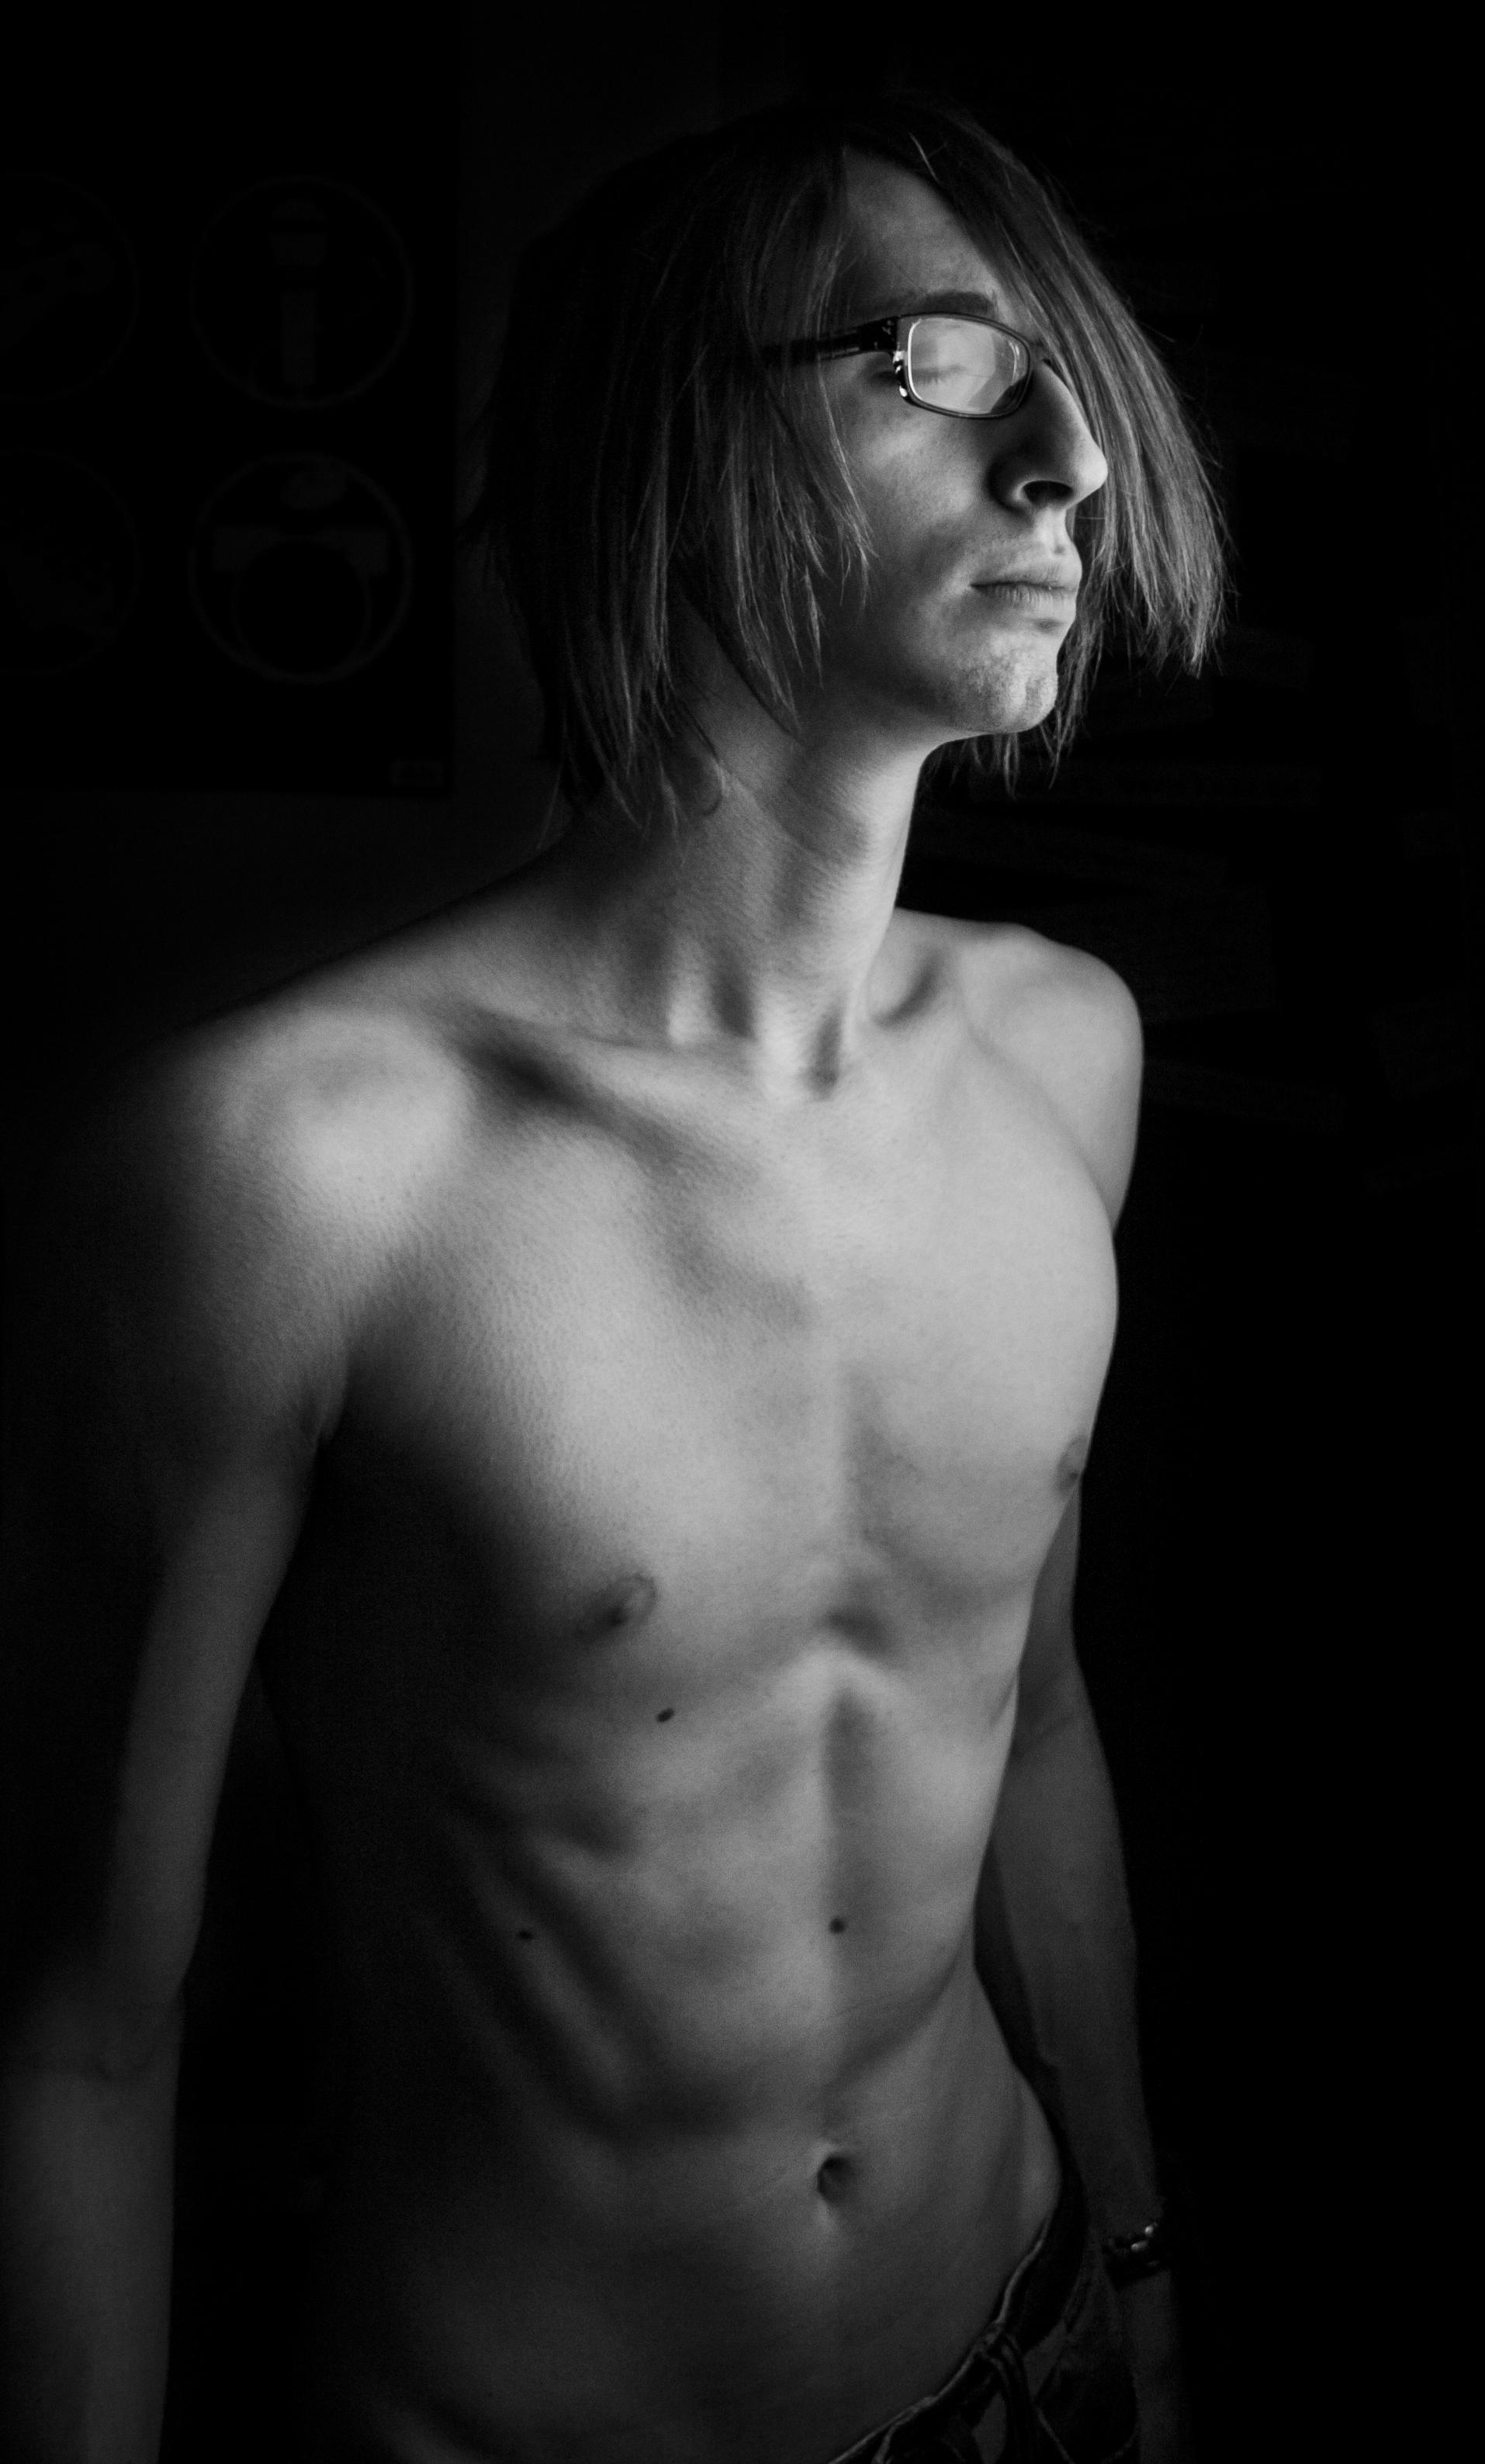 Shirtless Muscular Emo Fine Art.jpg